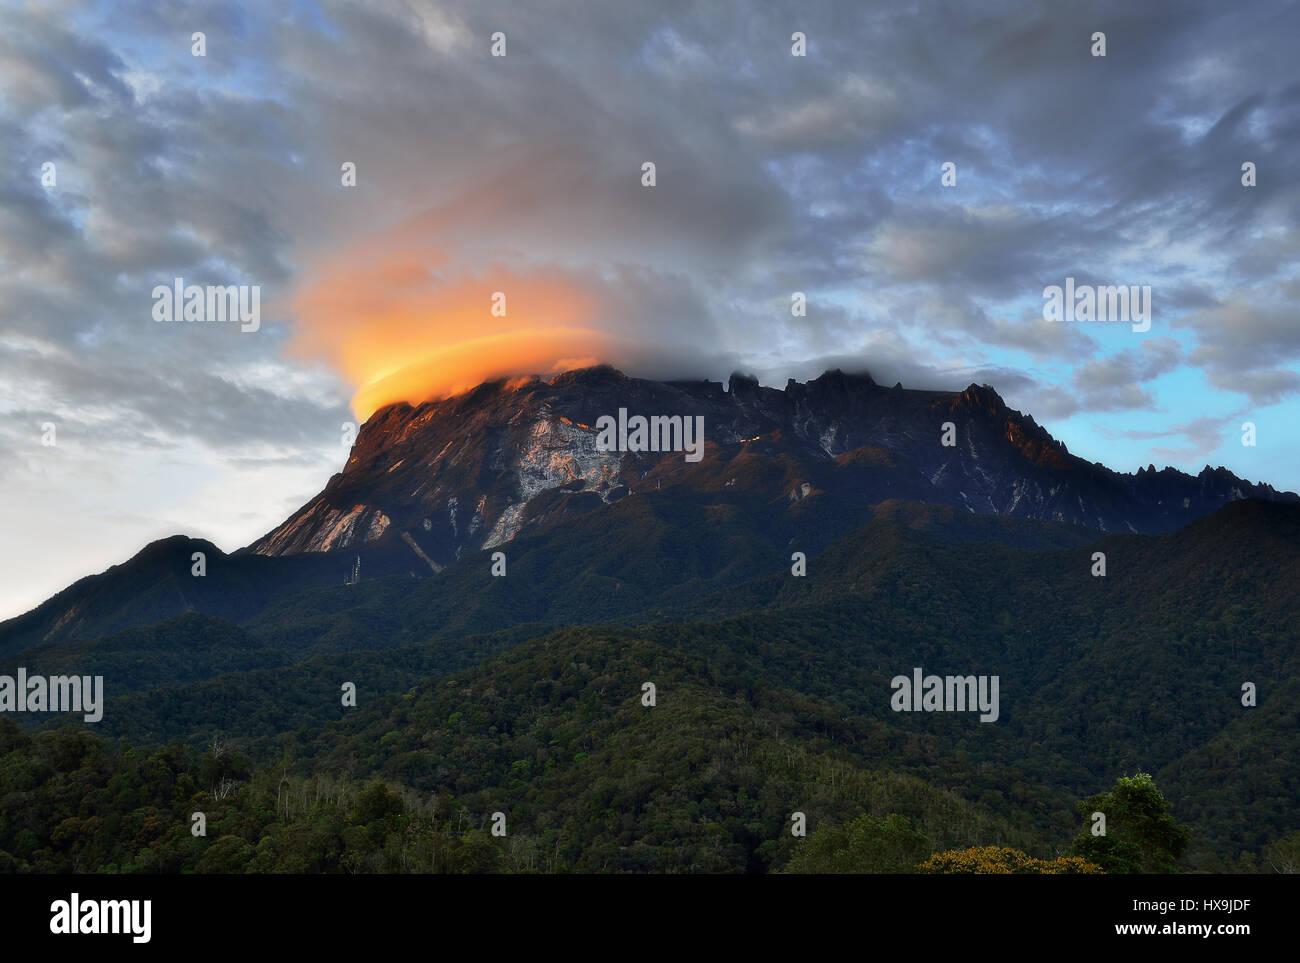 Sunset over Mount Kinabalu in Sabah Borneo, Malaysia. - Stock Image